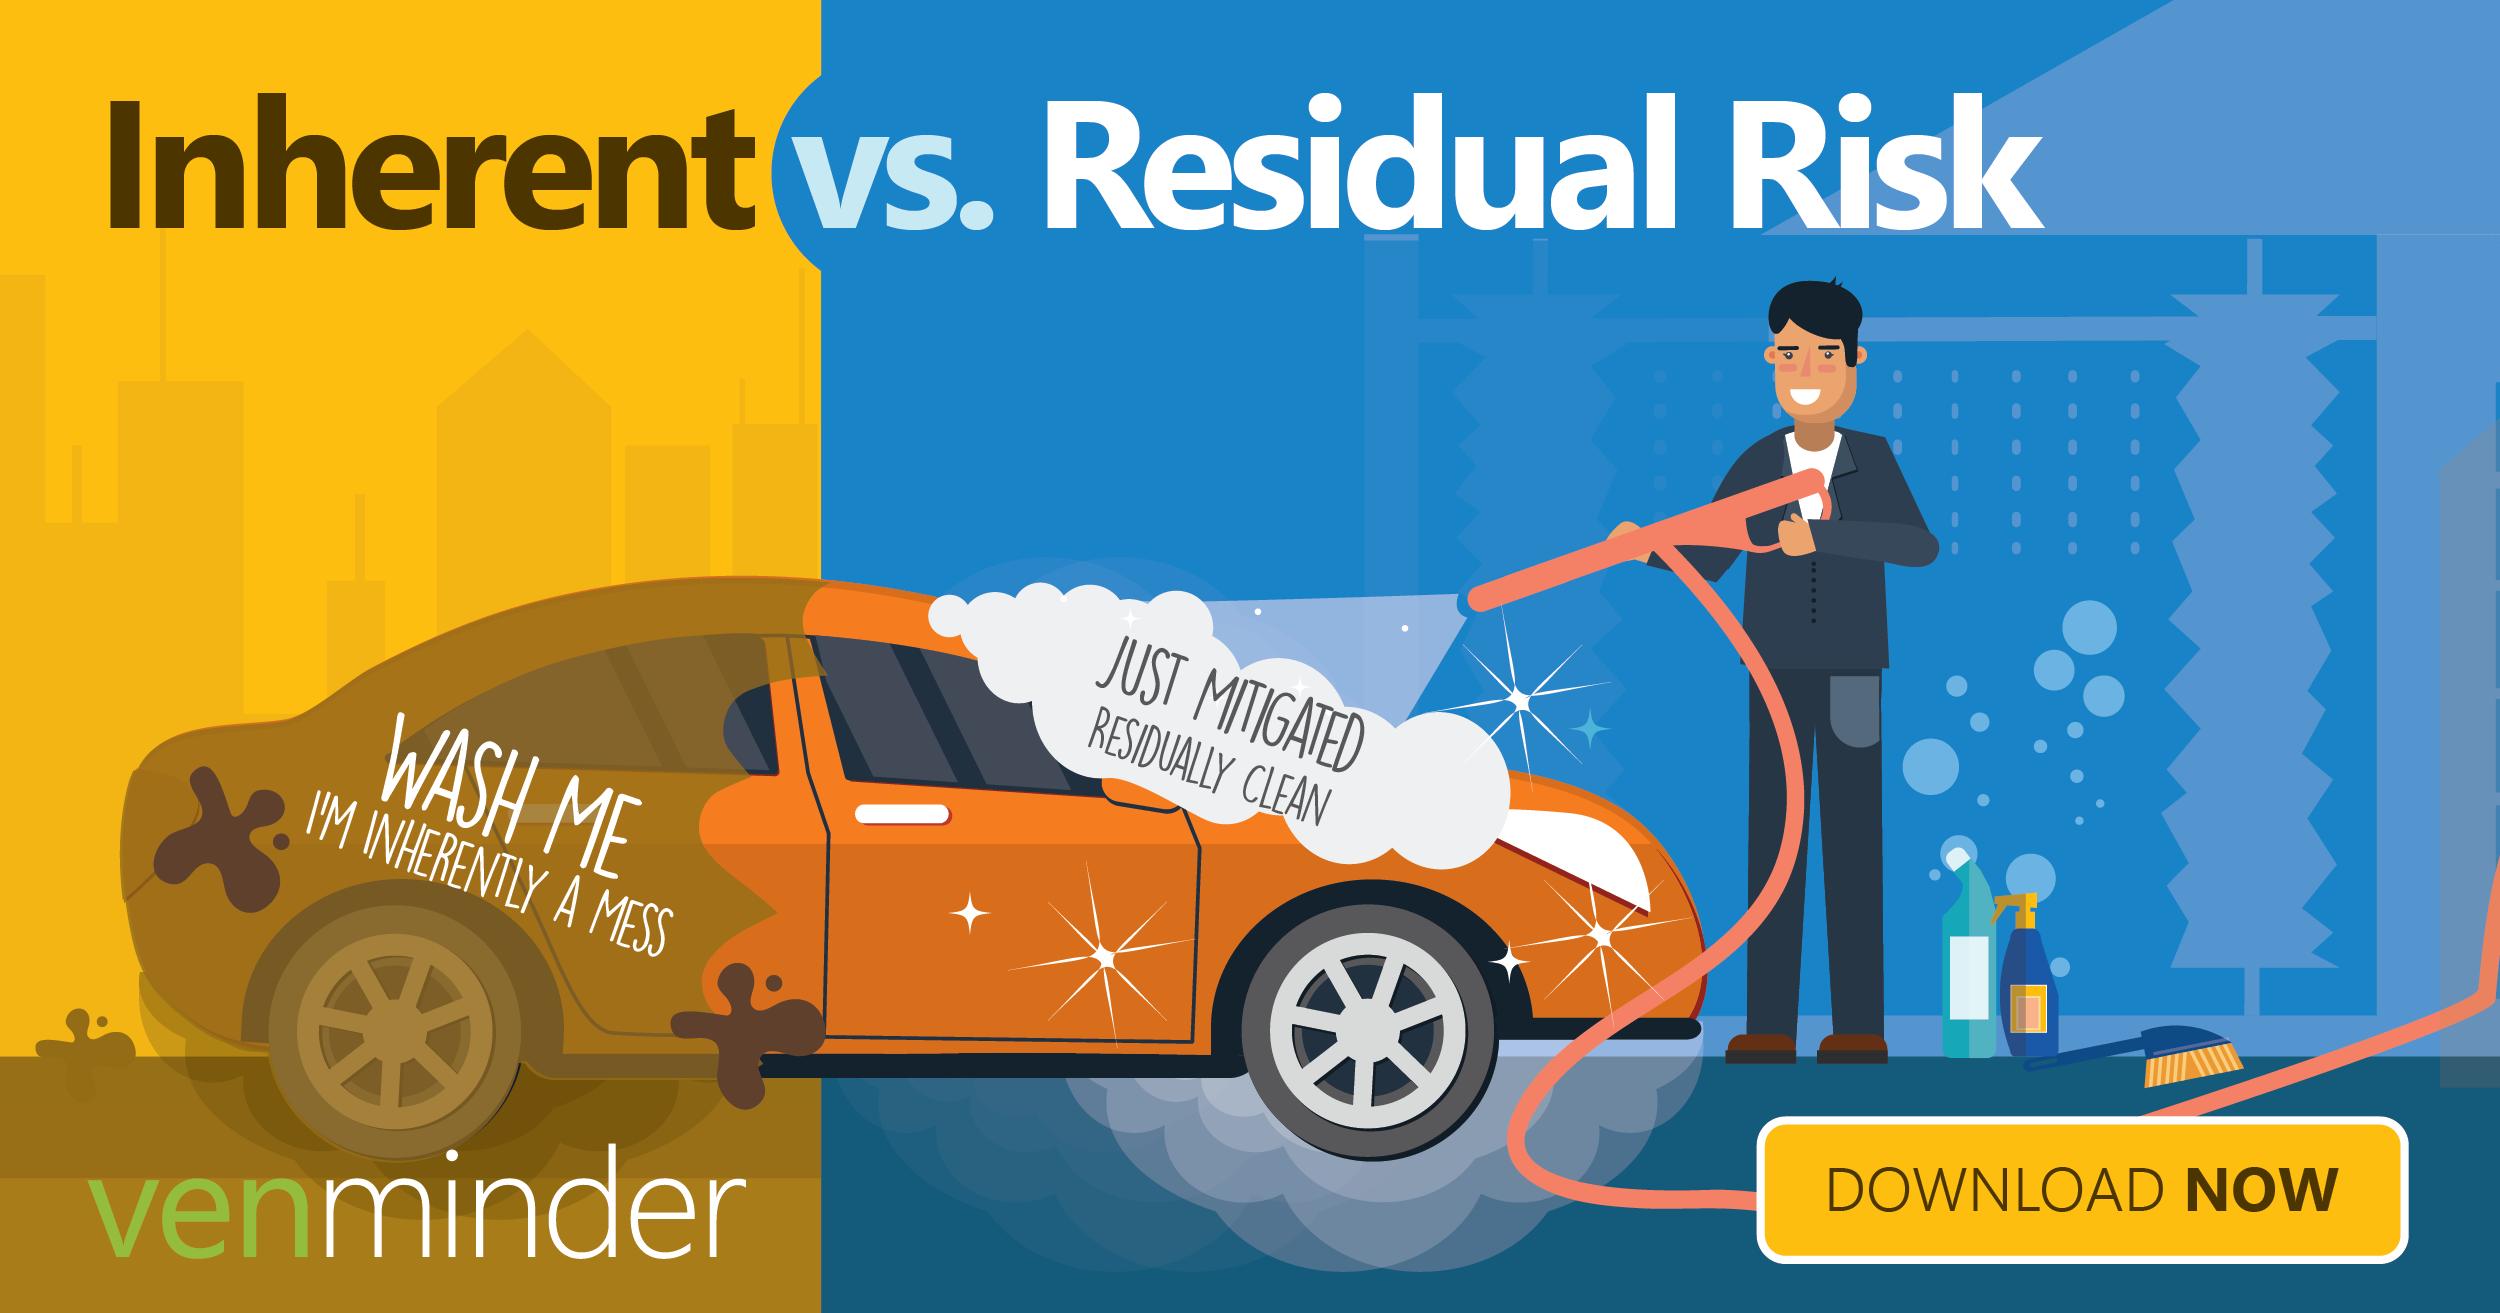 vendor management infographic  inherent risk vs  residual risk